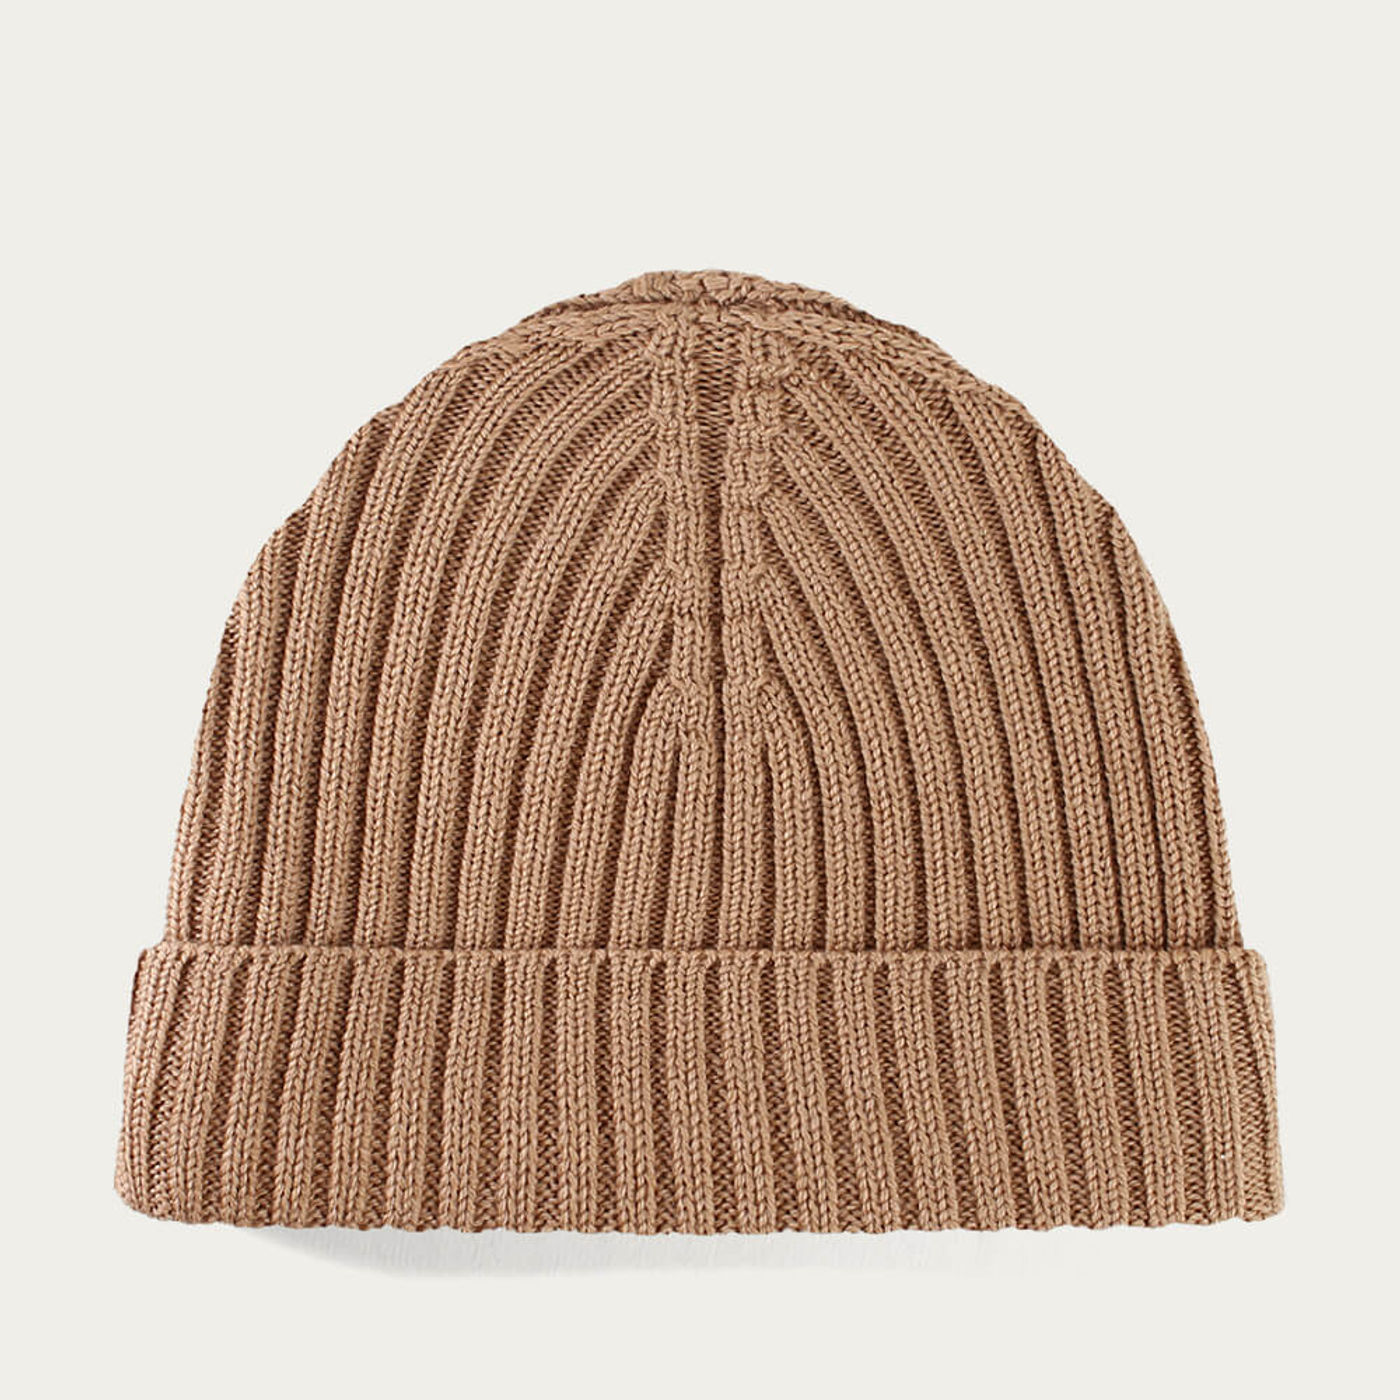 Beige Extrafine Merino Hat | Bombinate